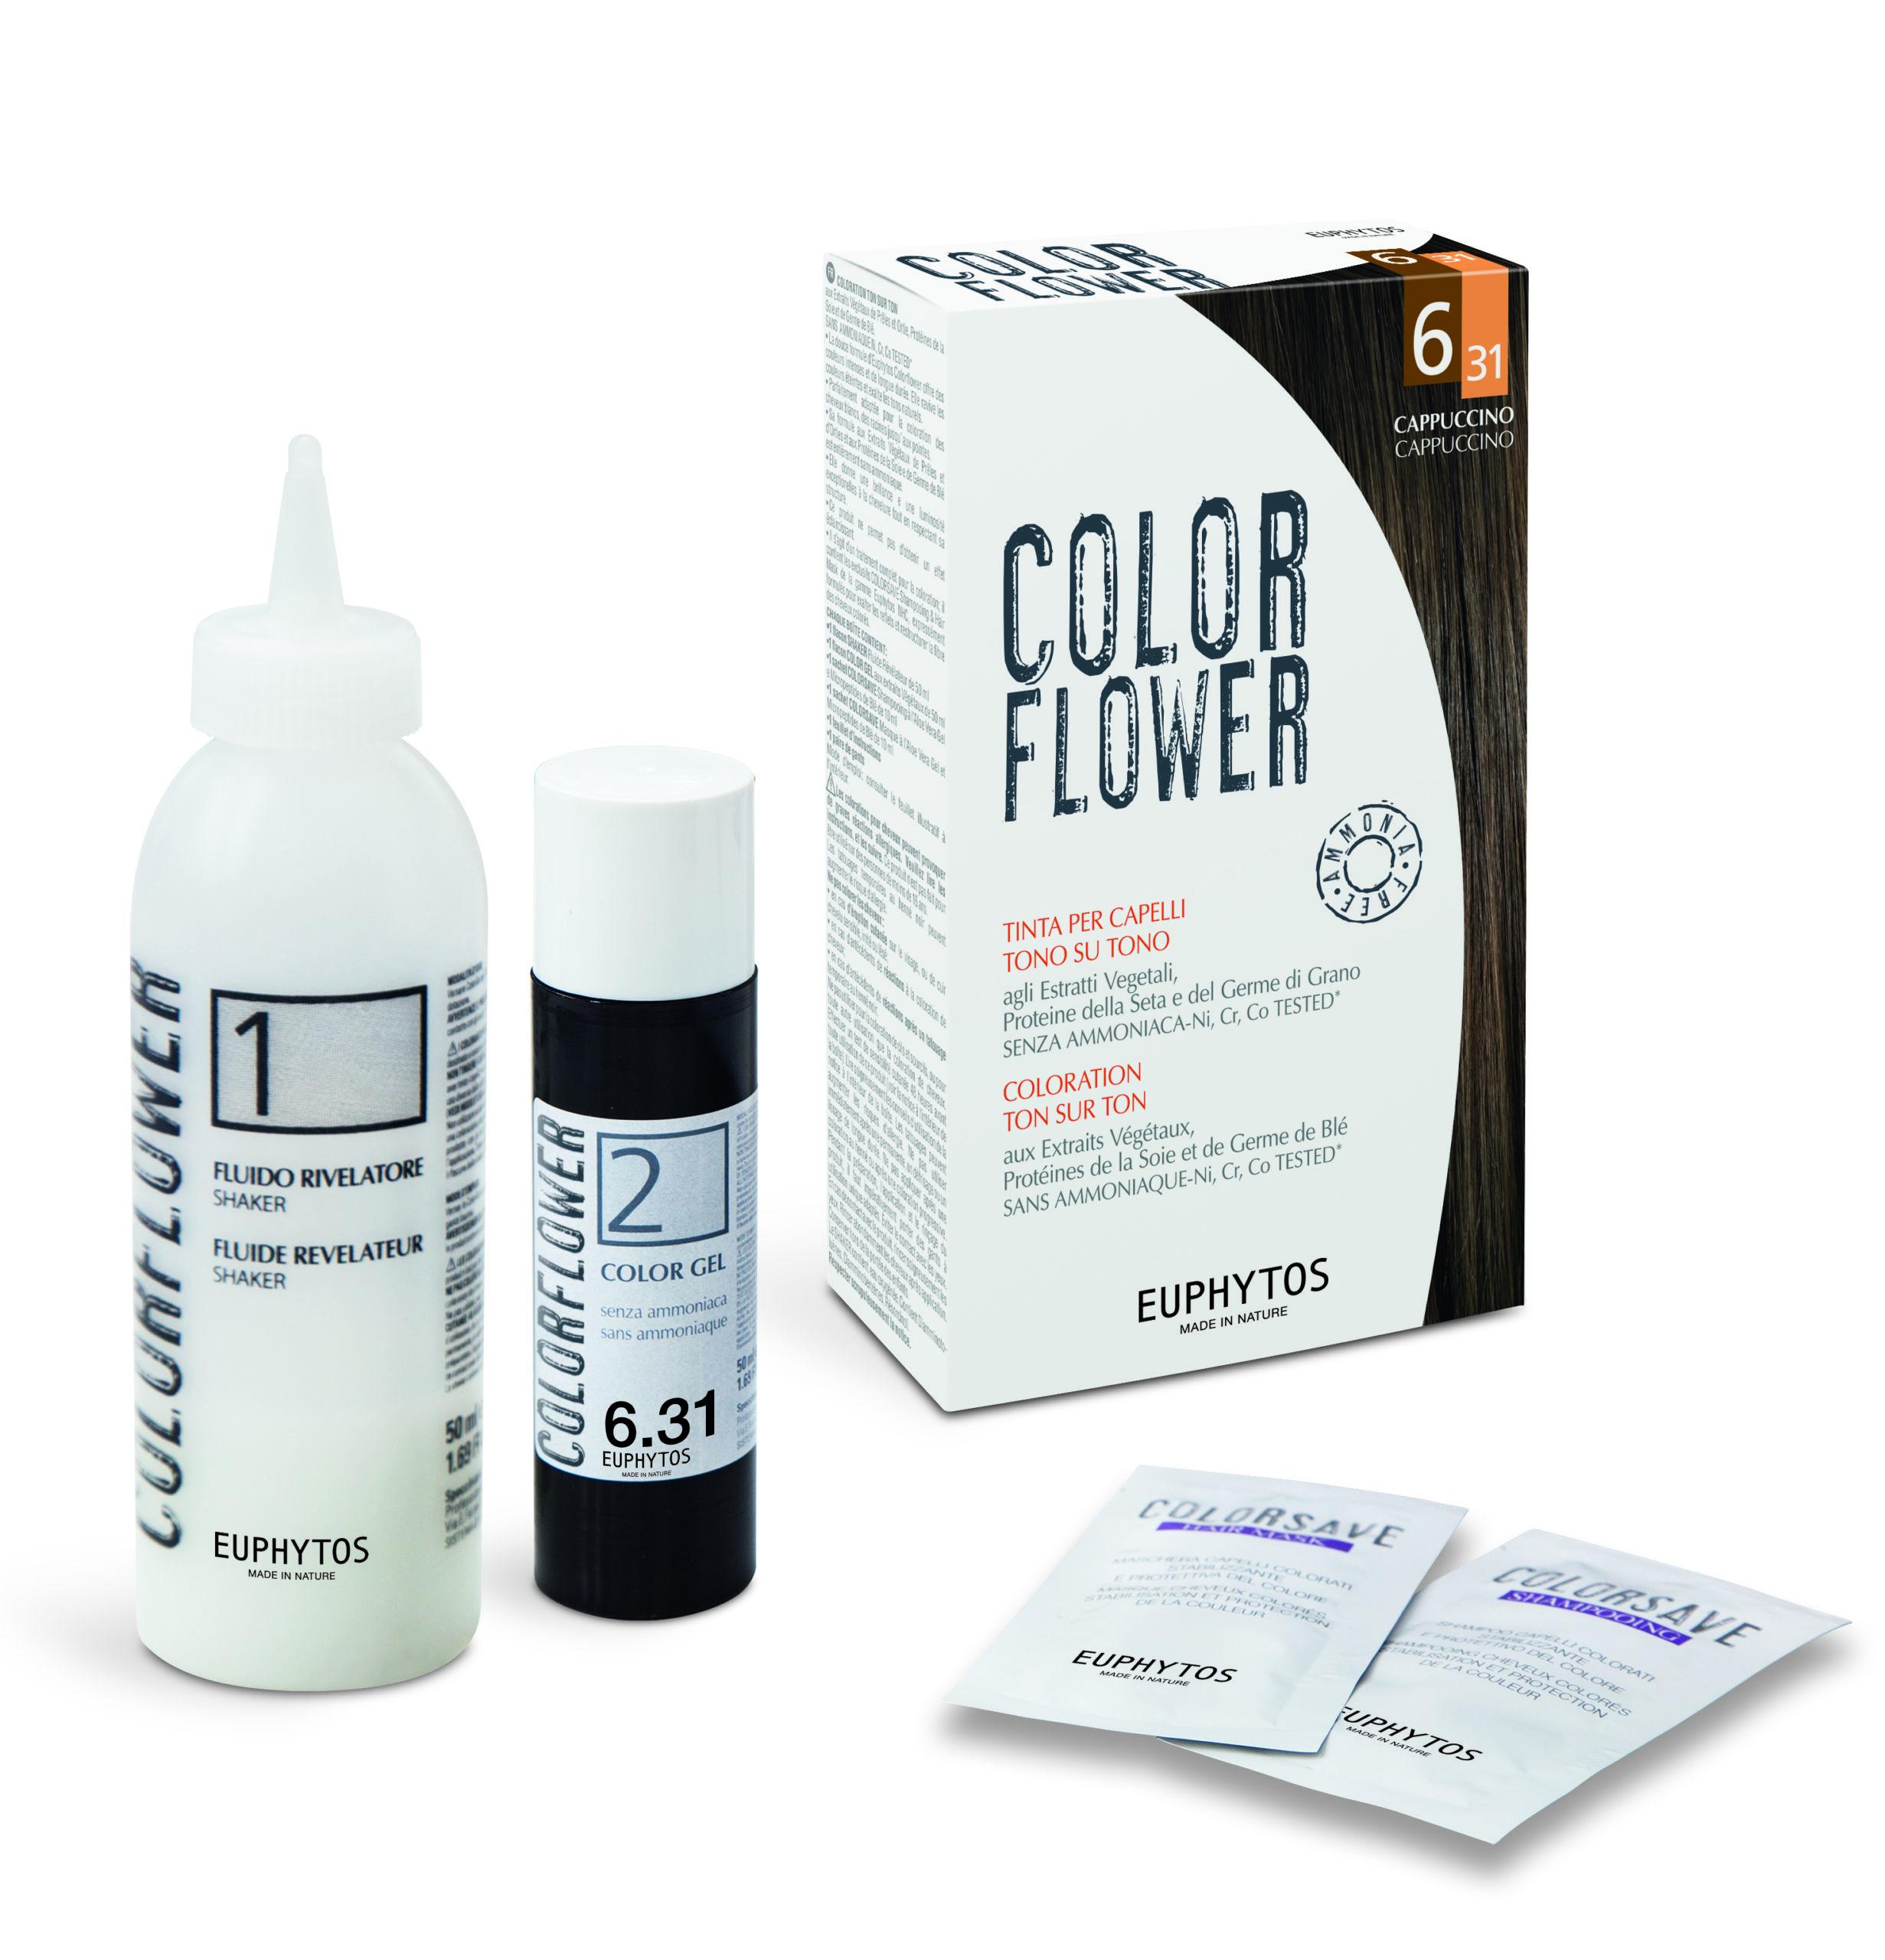 Pack-Color-Flower-6_31-scaled.jpg